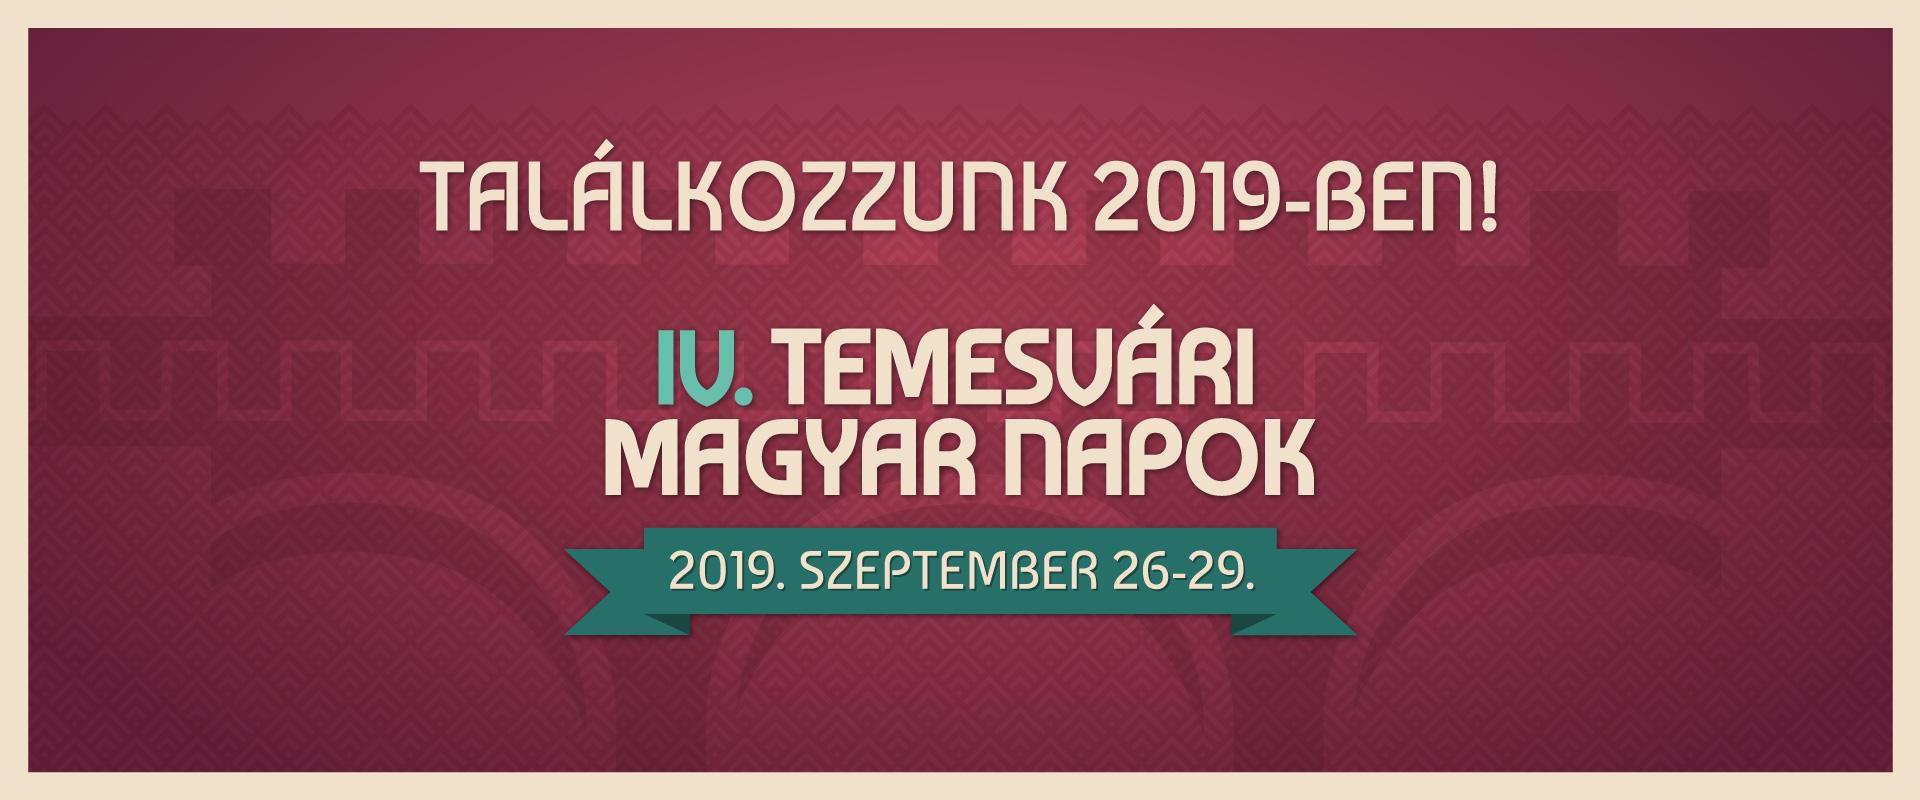 TMN_talakozzunk_2019